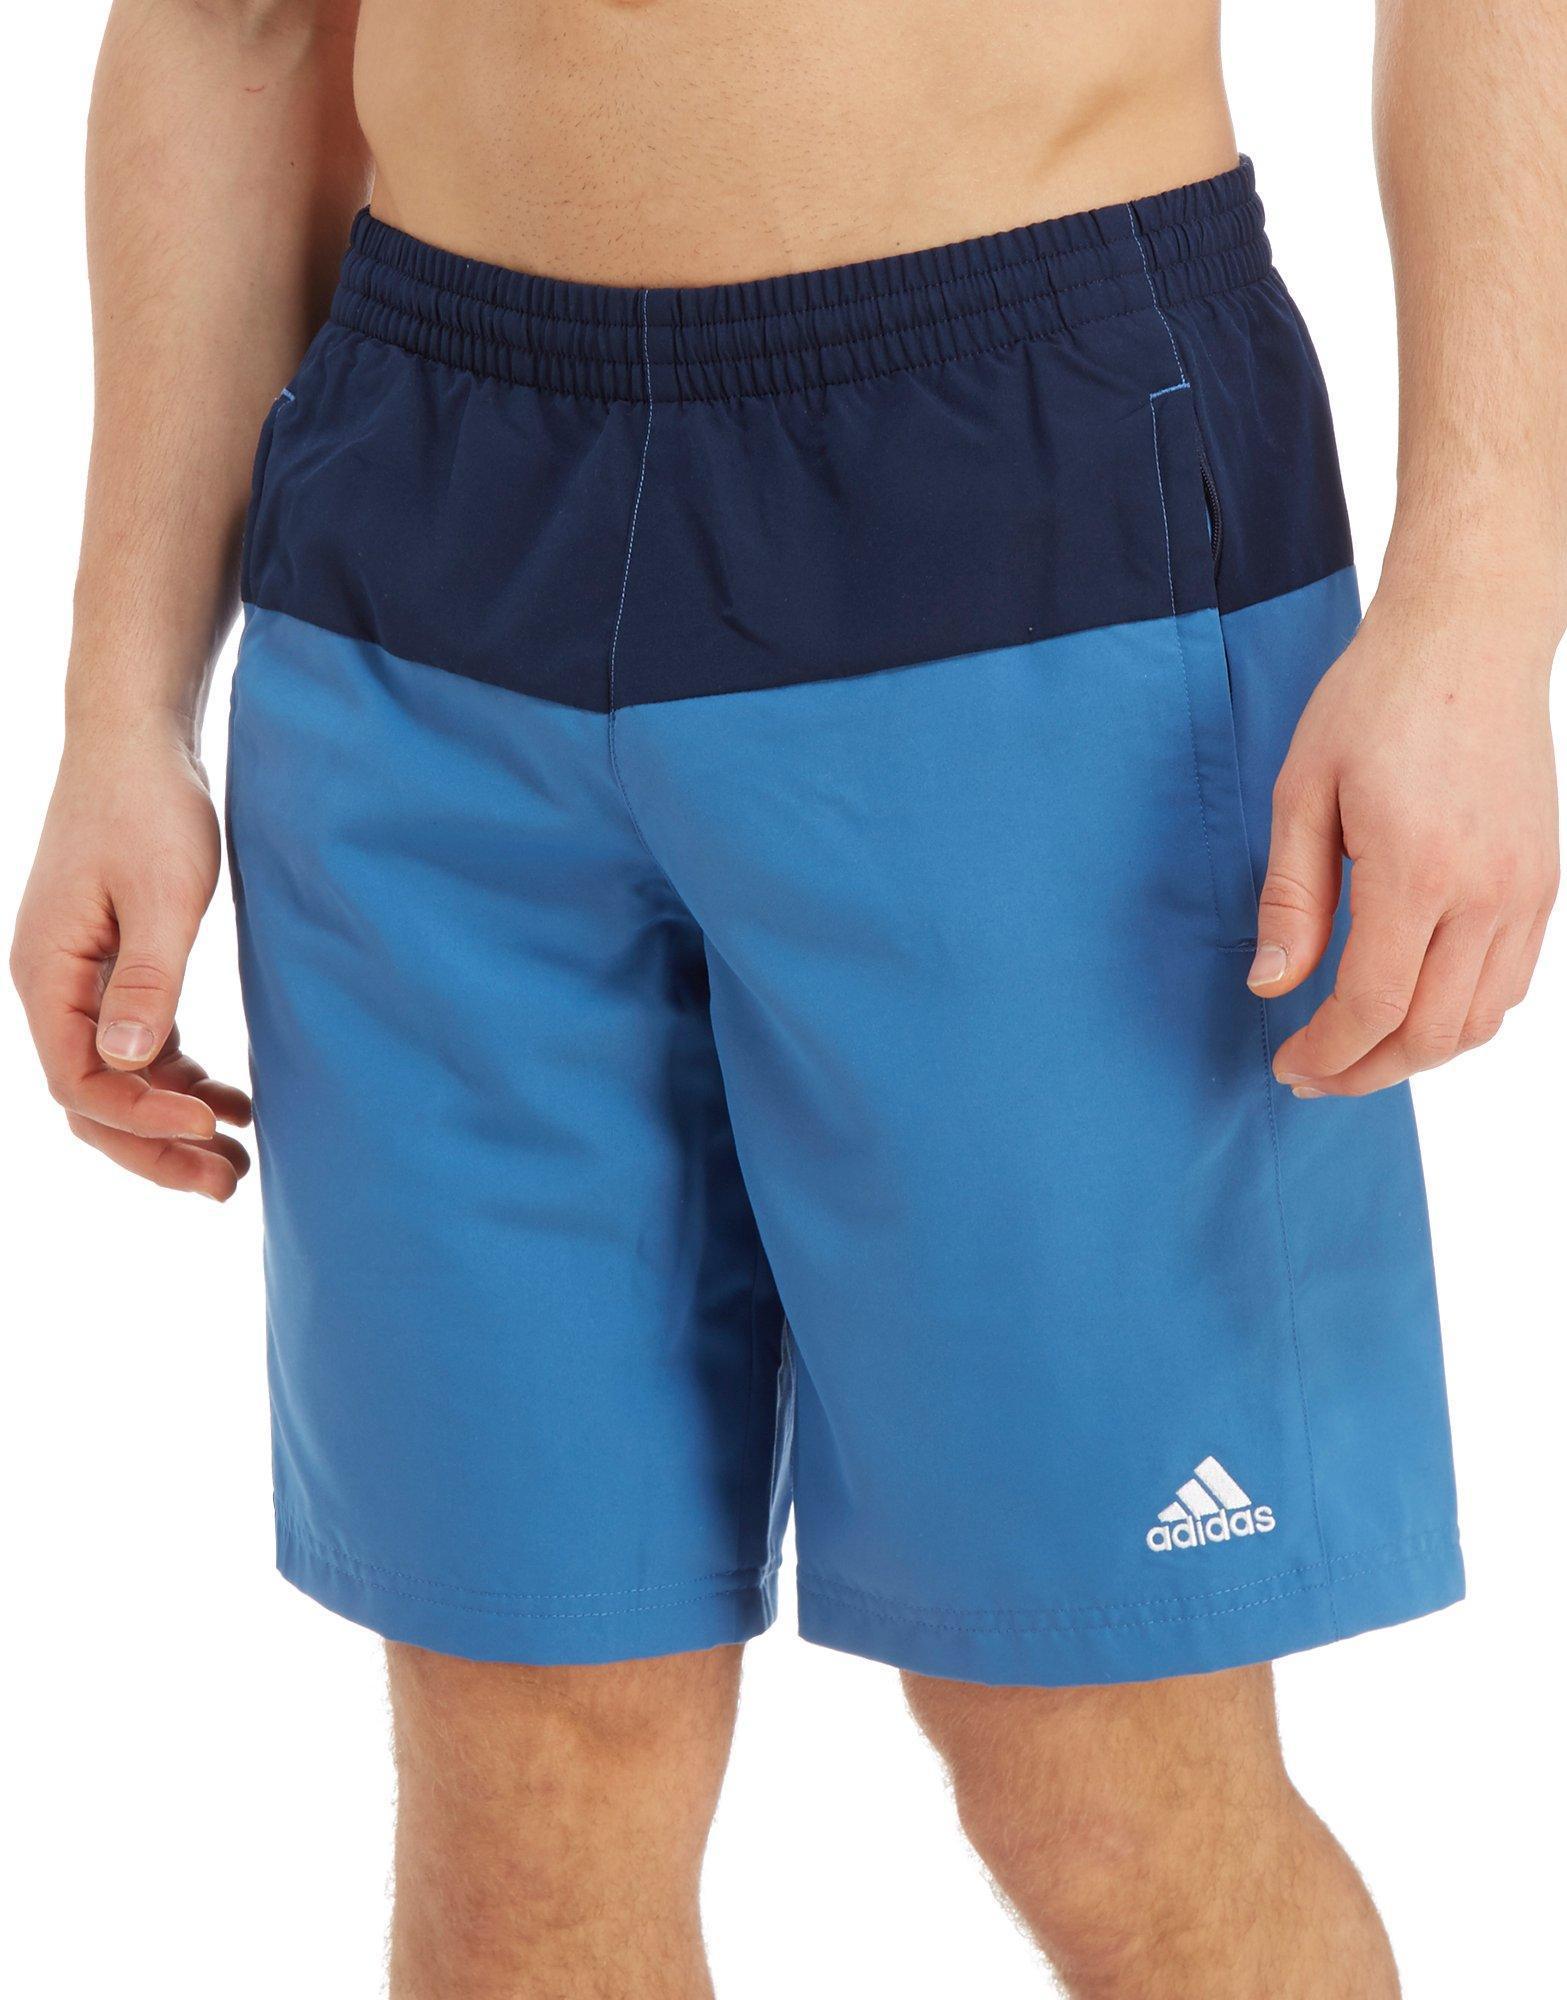 24f750fe91 adidas Colourblock Swim Shorts in Blue for Men - Lyst